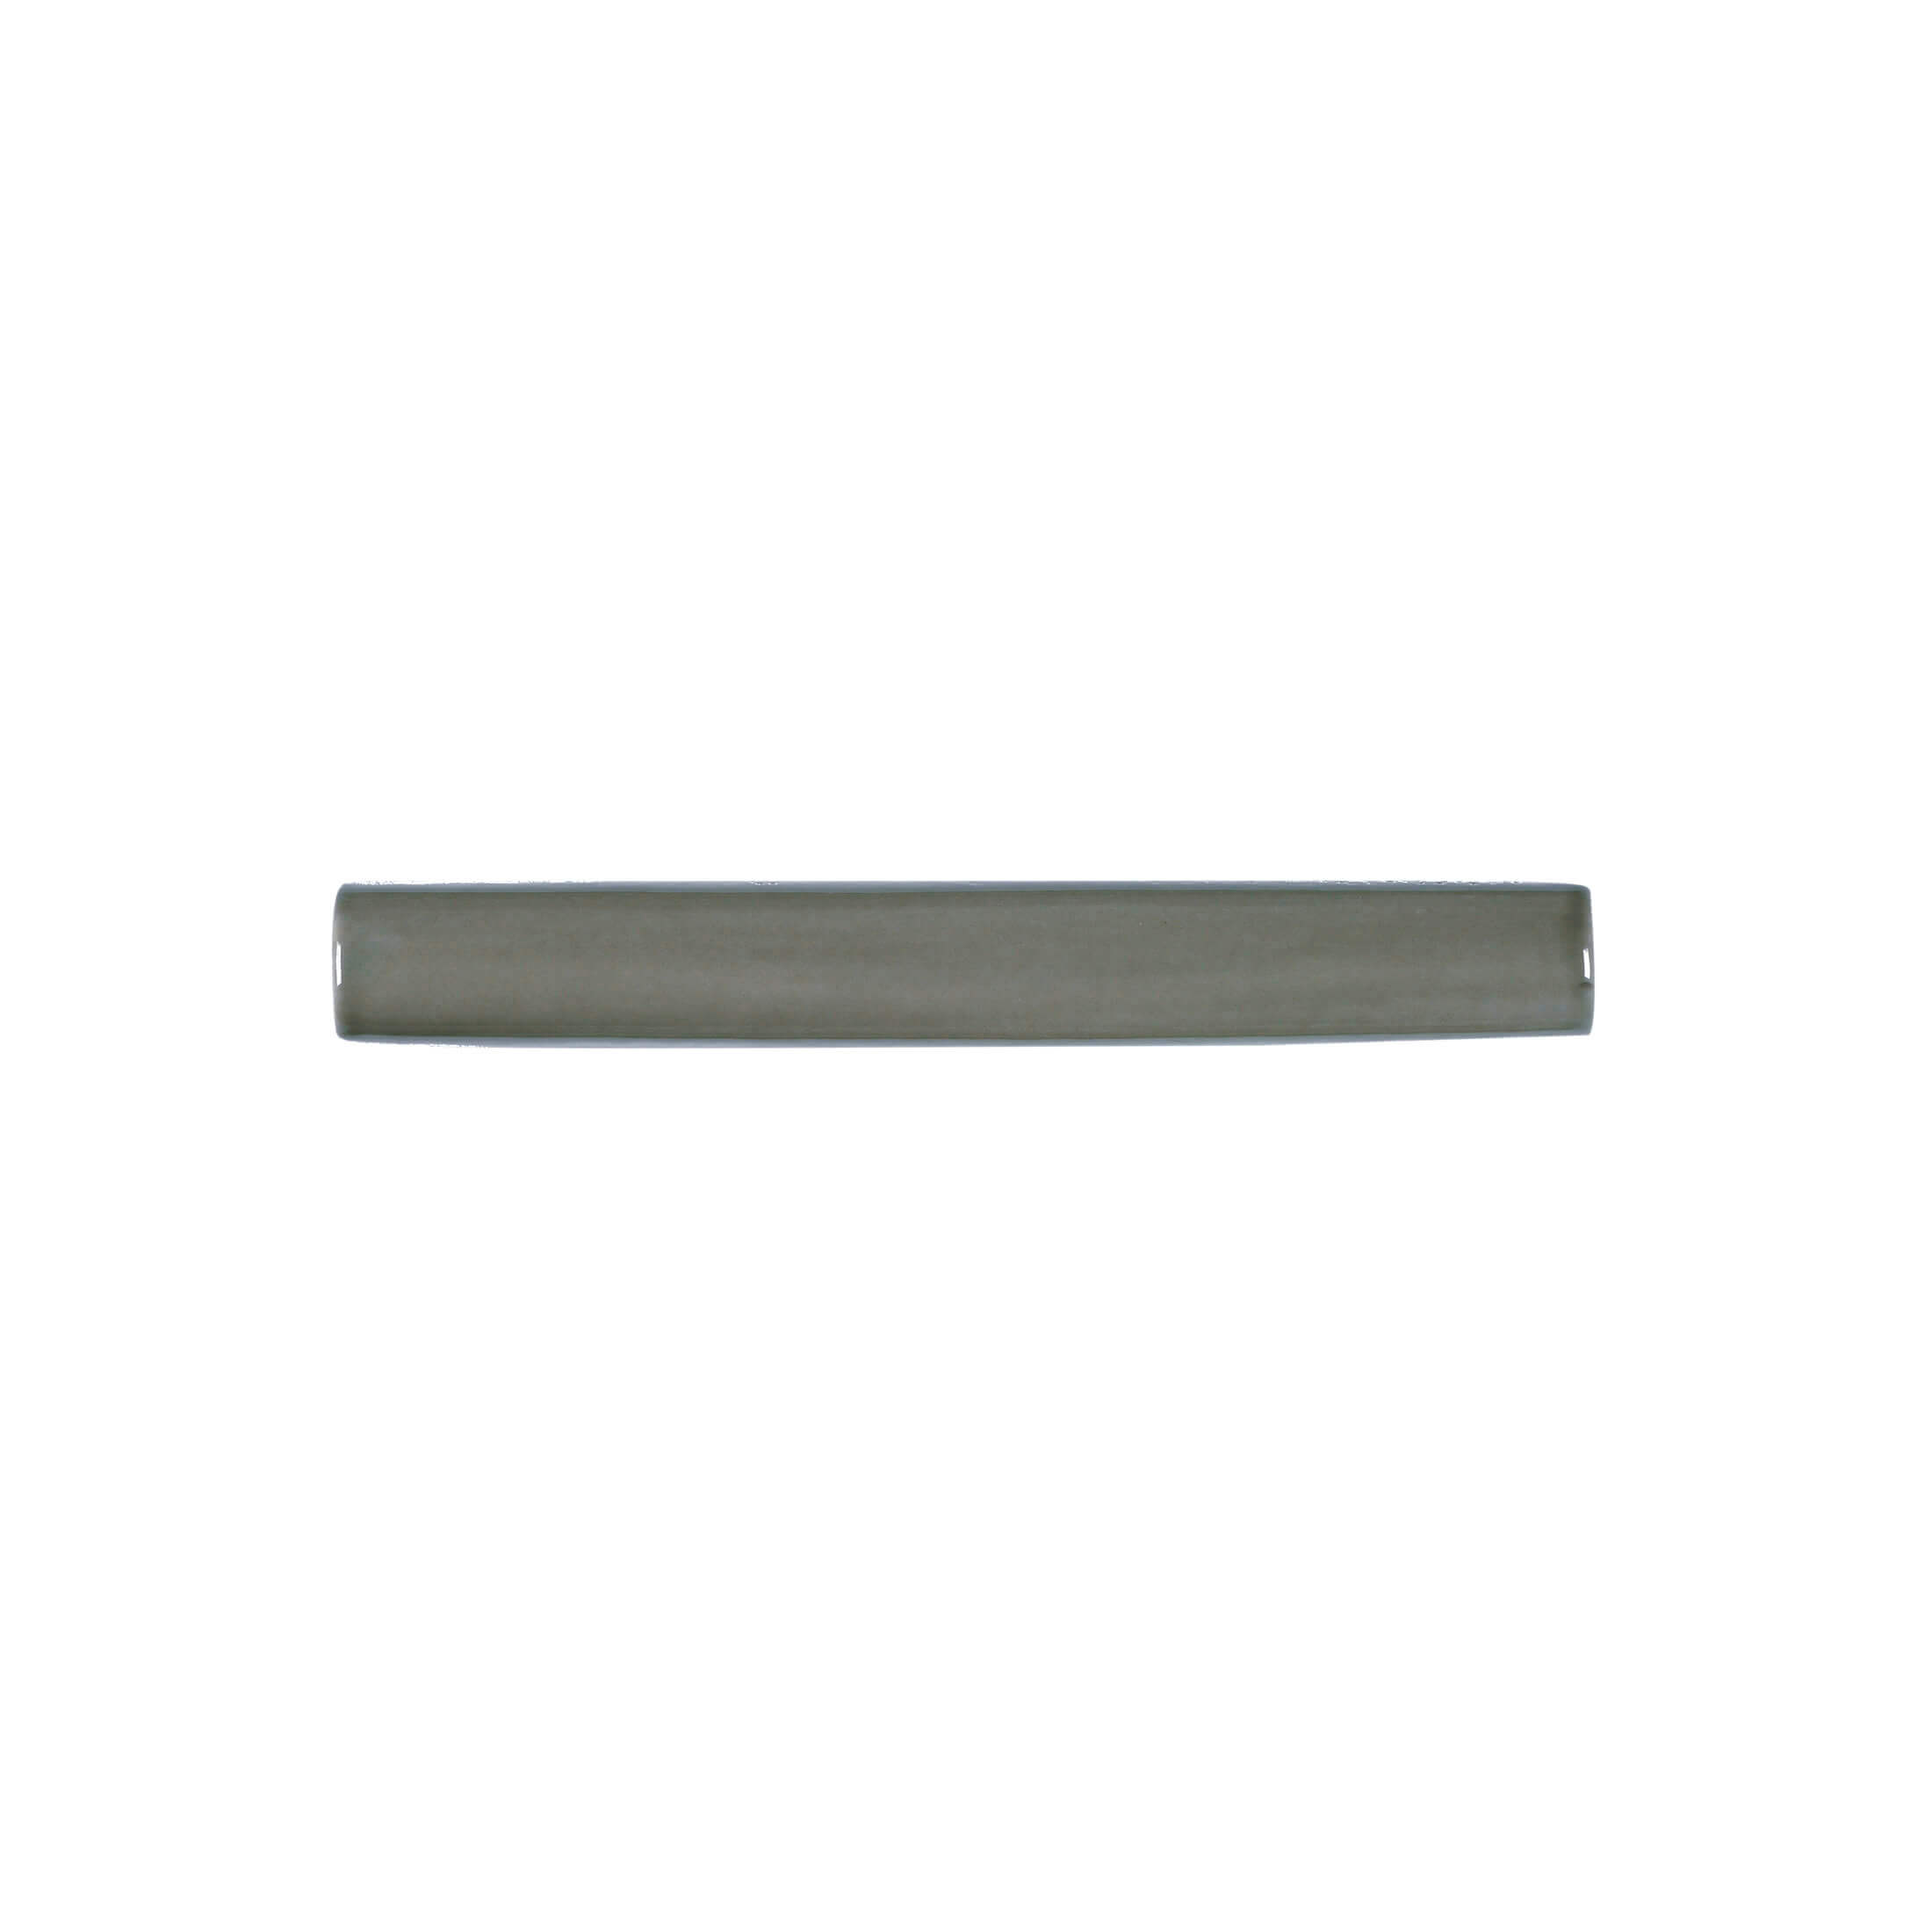 ADST4040 - BARRA LISA - 3 cm X 19.8 cm